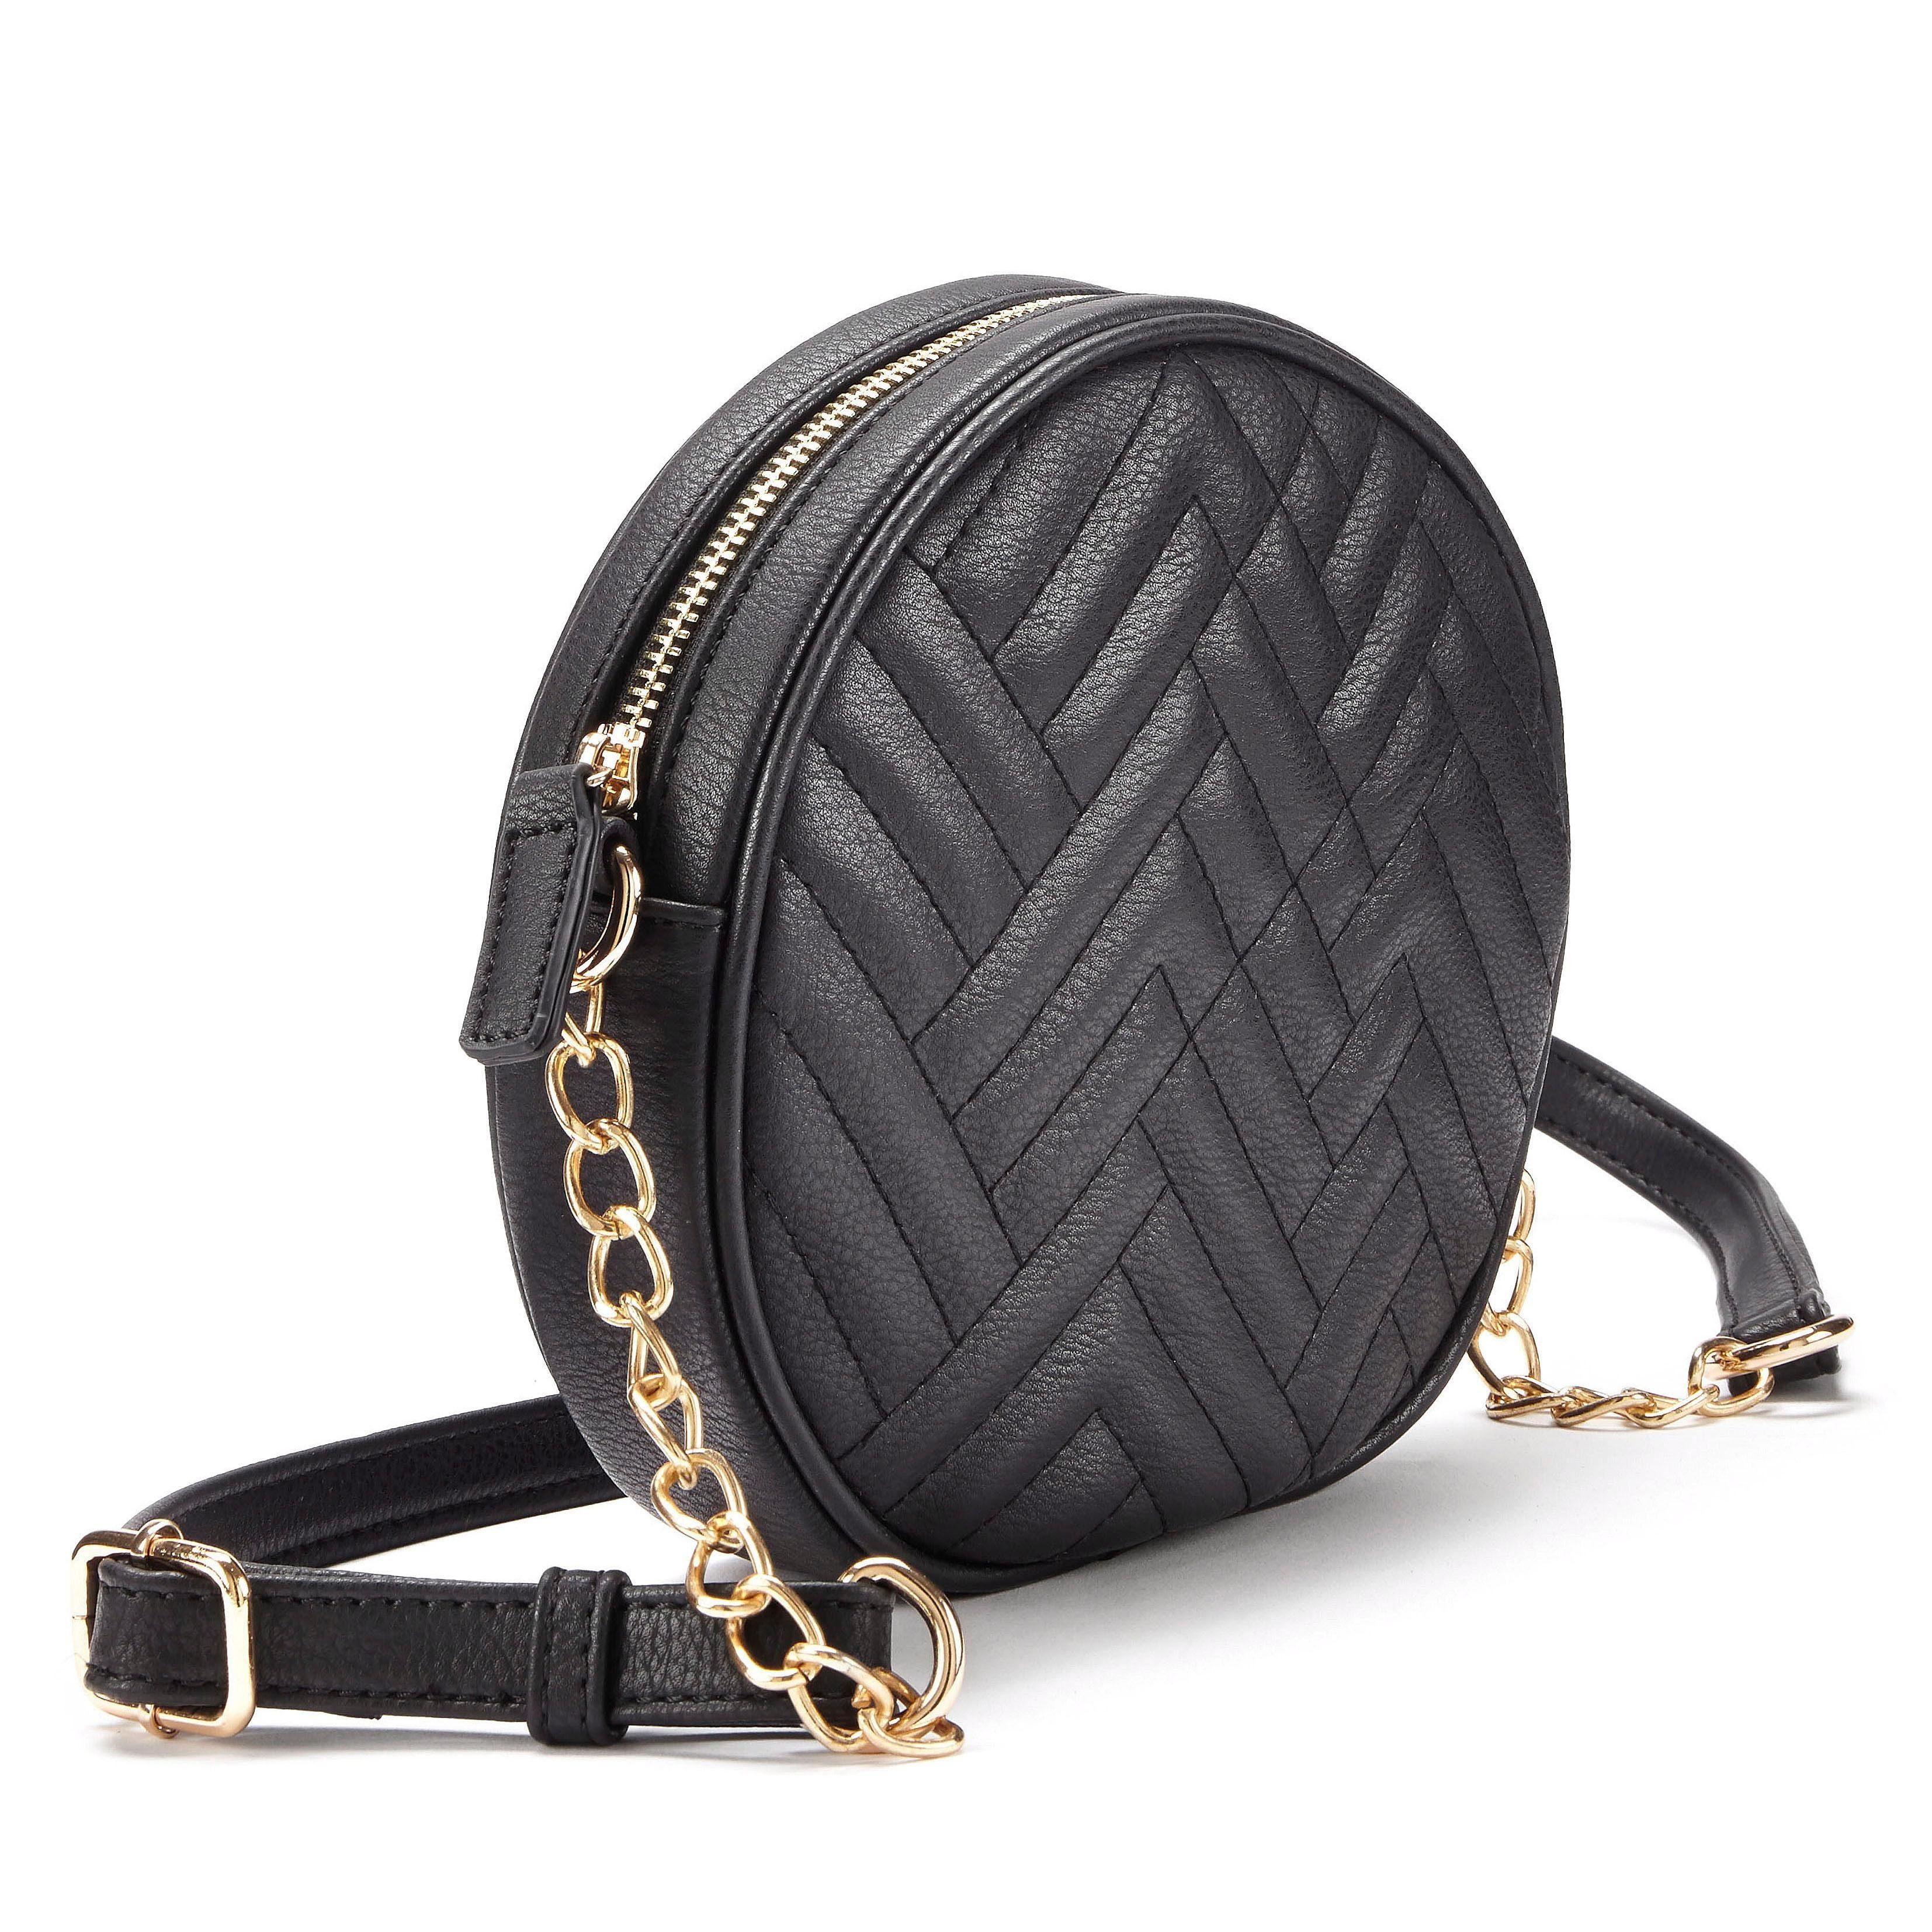 Lascana Lascana Bag Mini Bag Tasche Runde Tasche Lascana Runde Mini fwBx74qAx